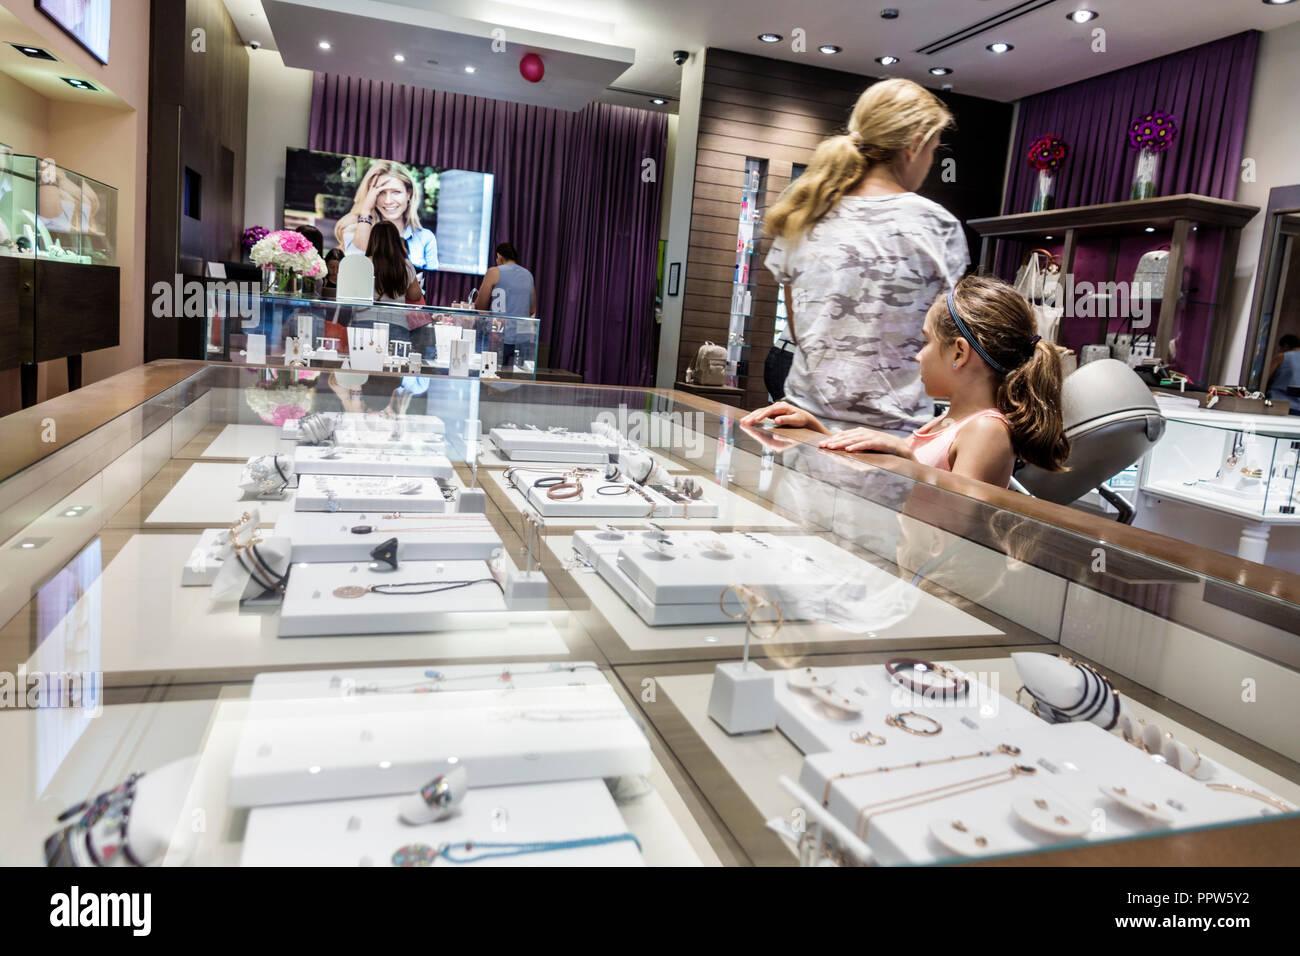 Miami Florida Kendall Dadeland Mall shopping Tous inside Spanish designer handbags jewelry jewellery accessories - Stock Image